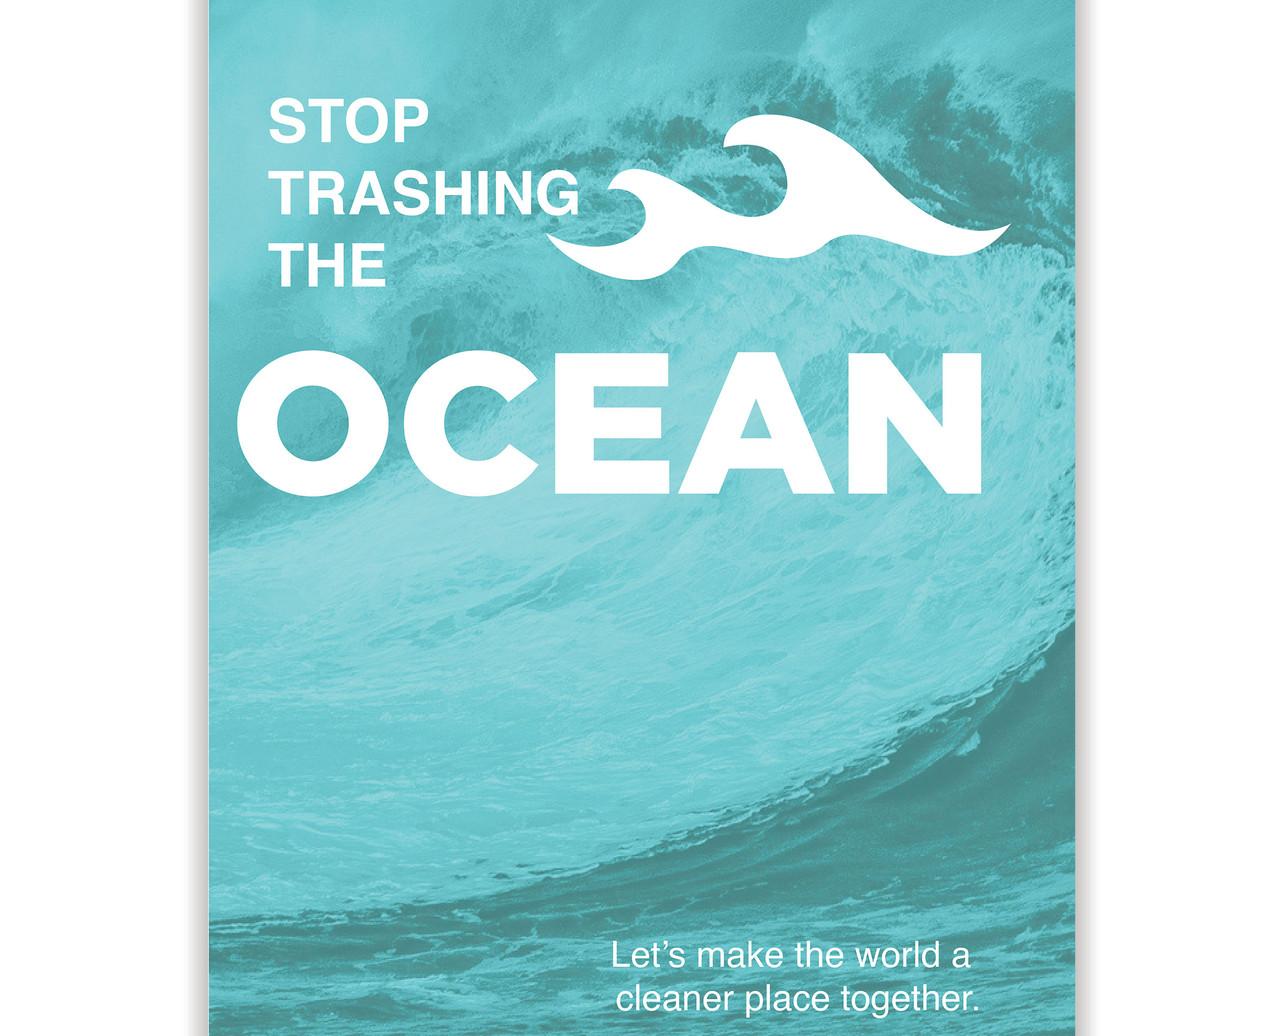 Ocean Poster Better World Campaign